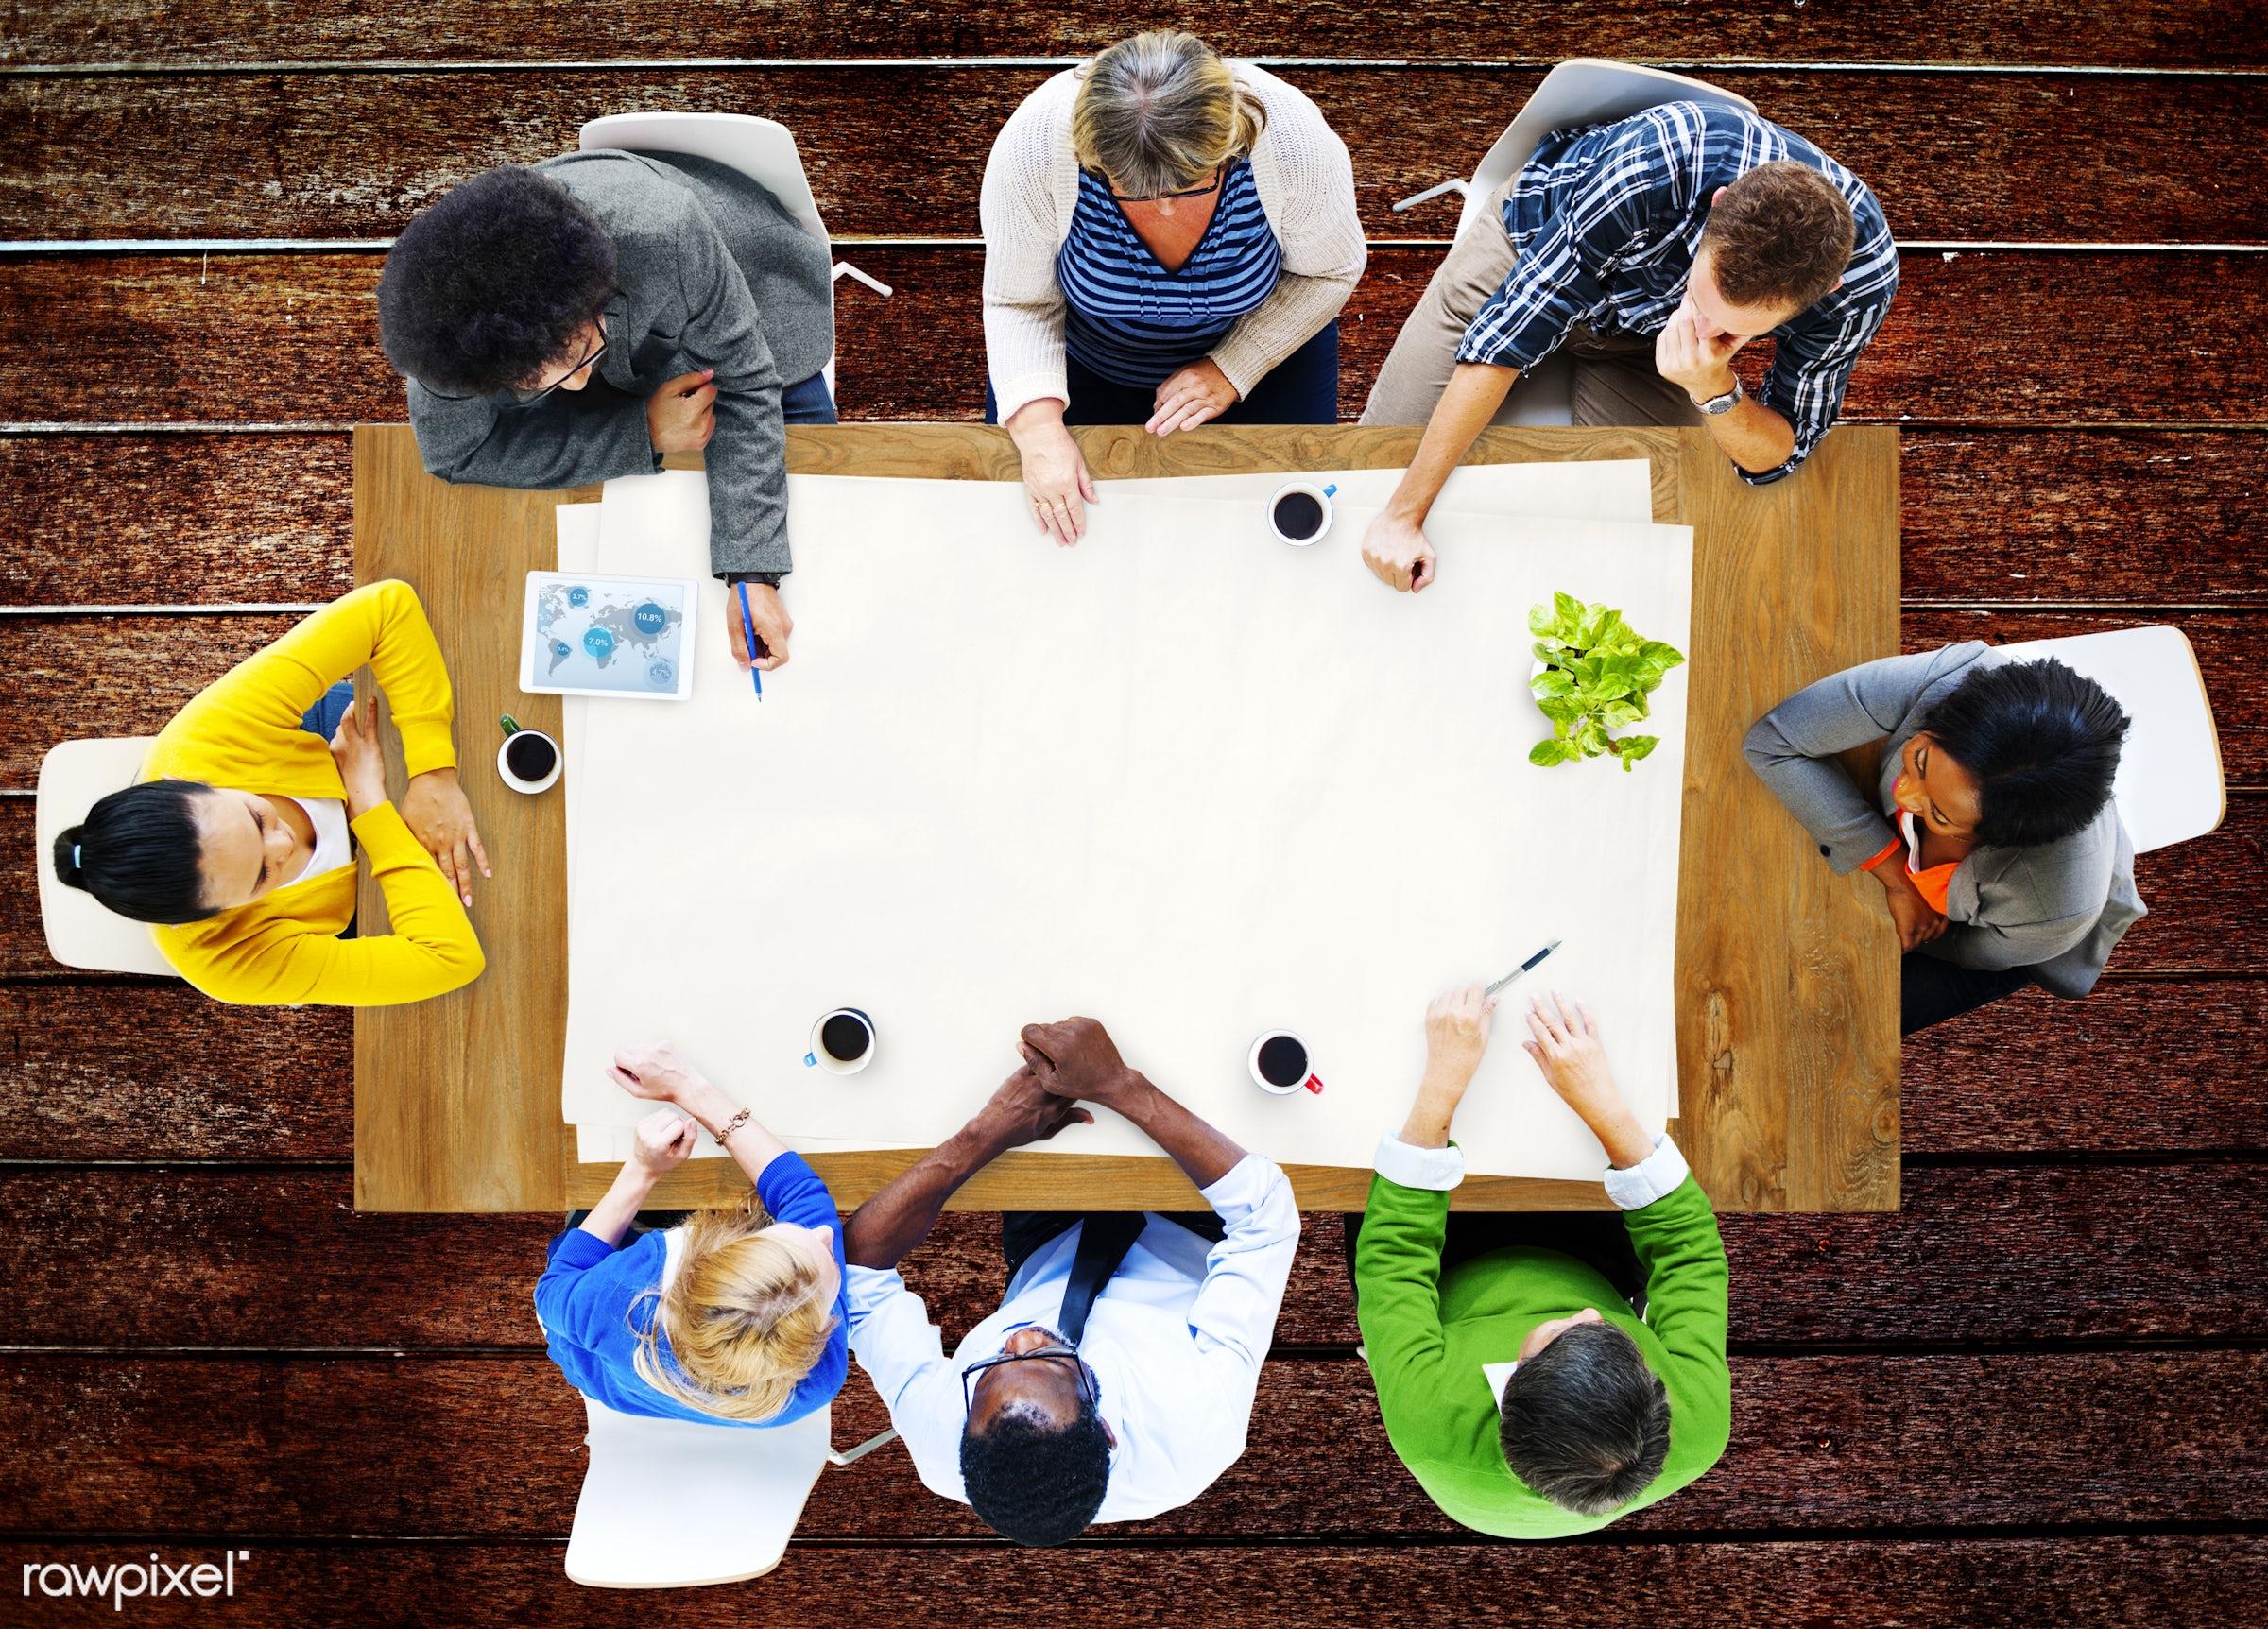 aerial view, brainstorming, business, business people, casual, communication, concrete floor, diversity, ethnicity, floor,...